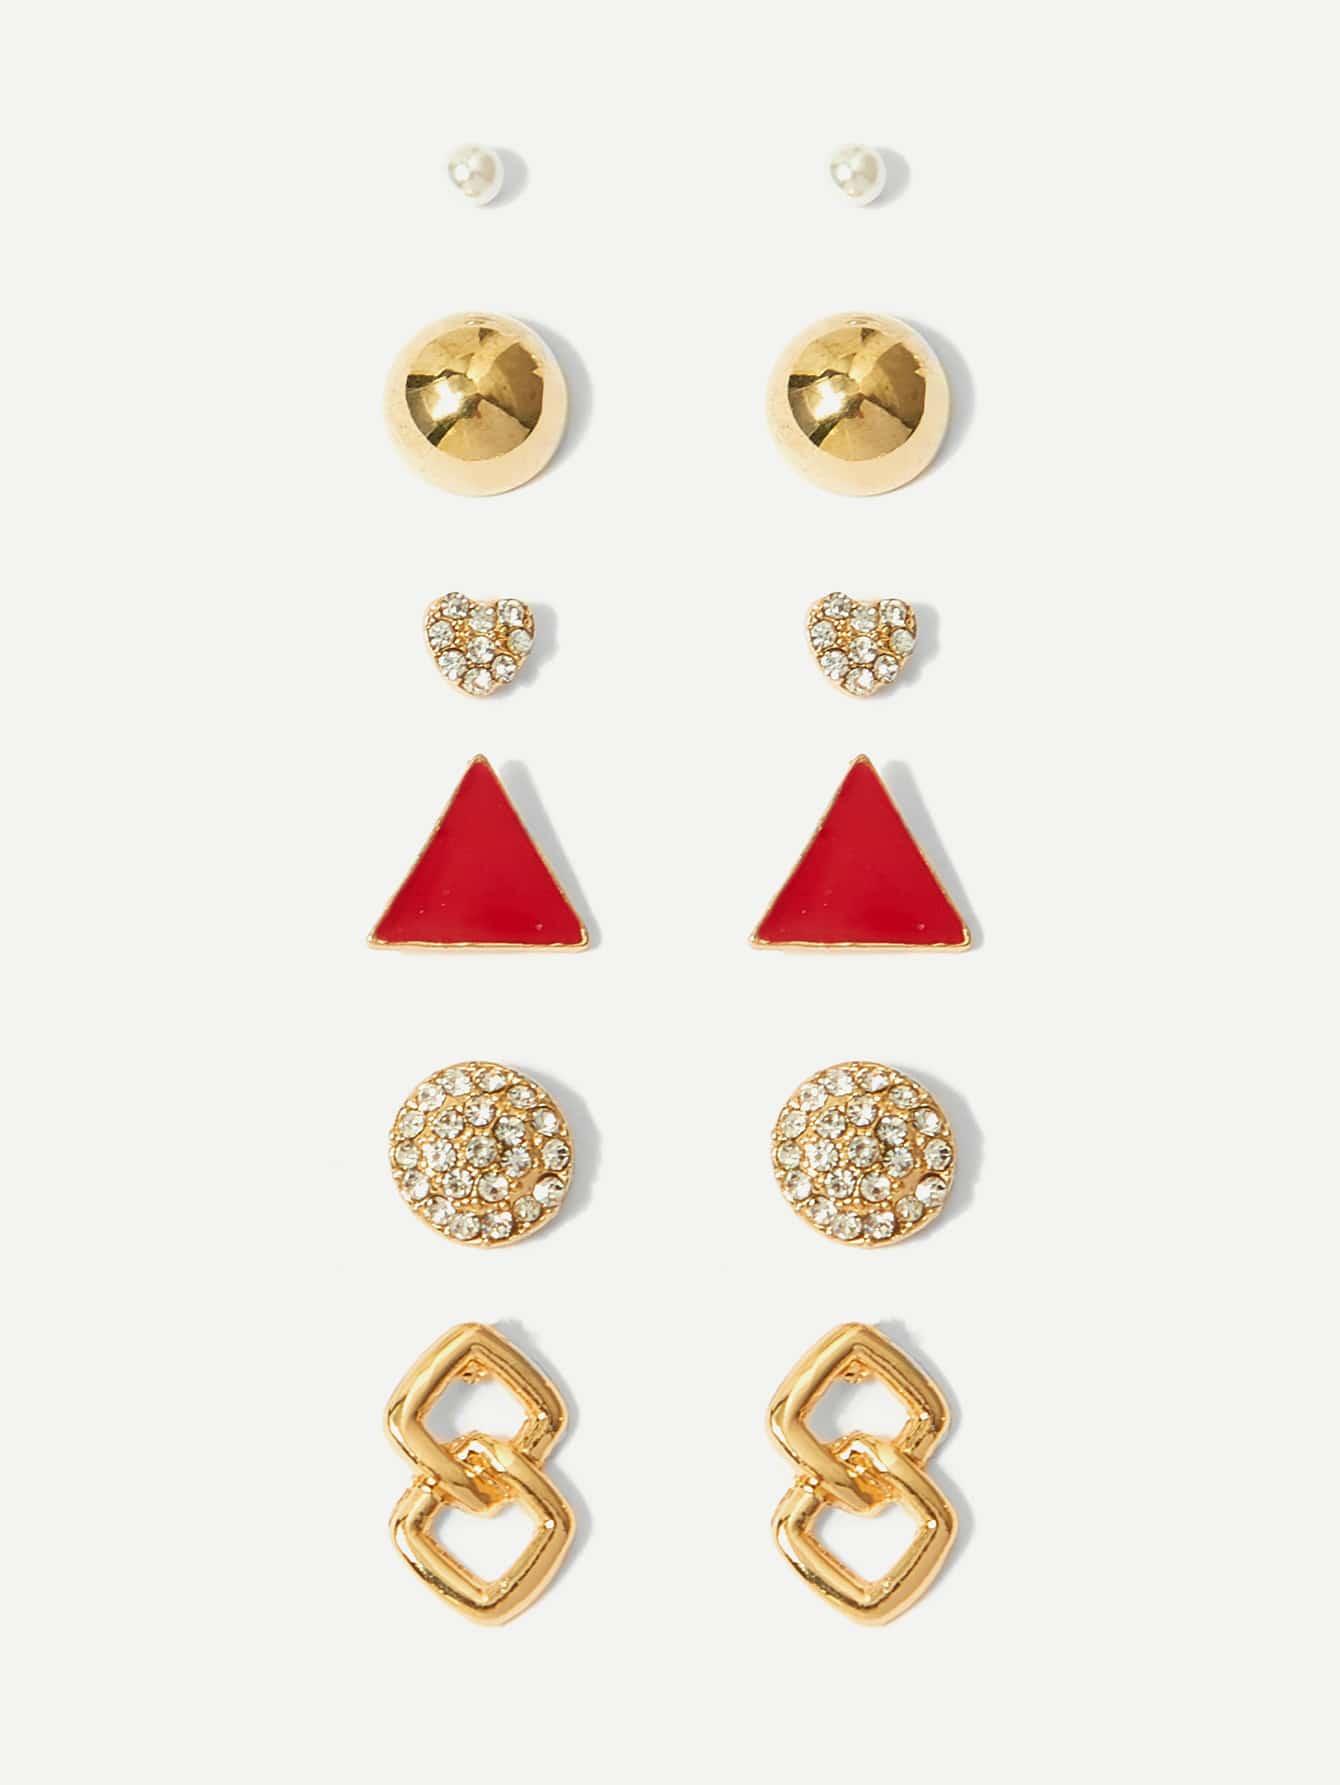 Triangle Detail Rhinestone Stud Earrings 6pairs vintage rhinestone triangle pendant earrings